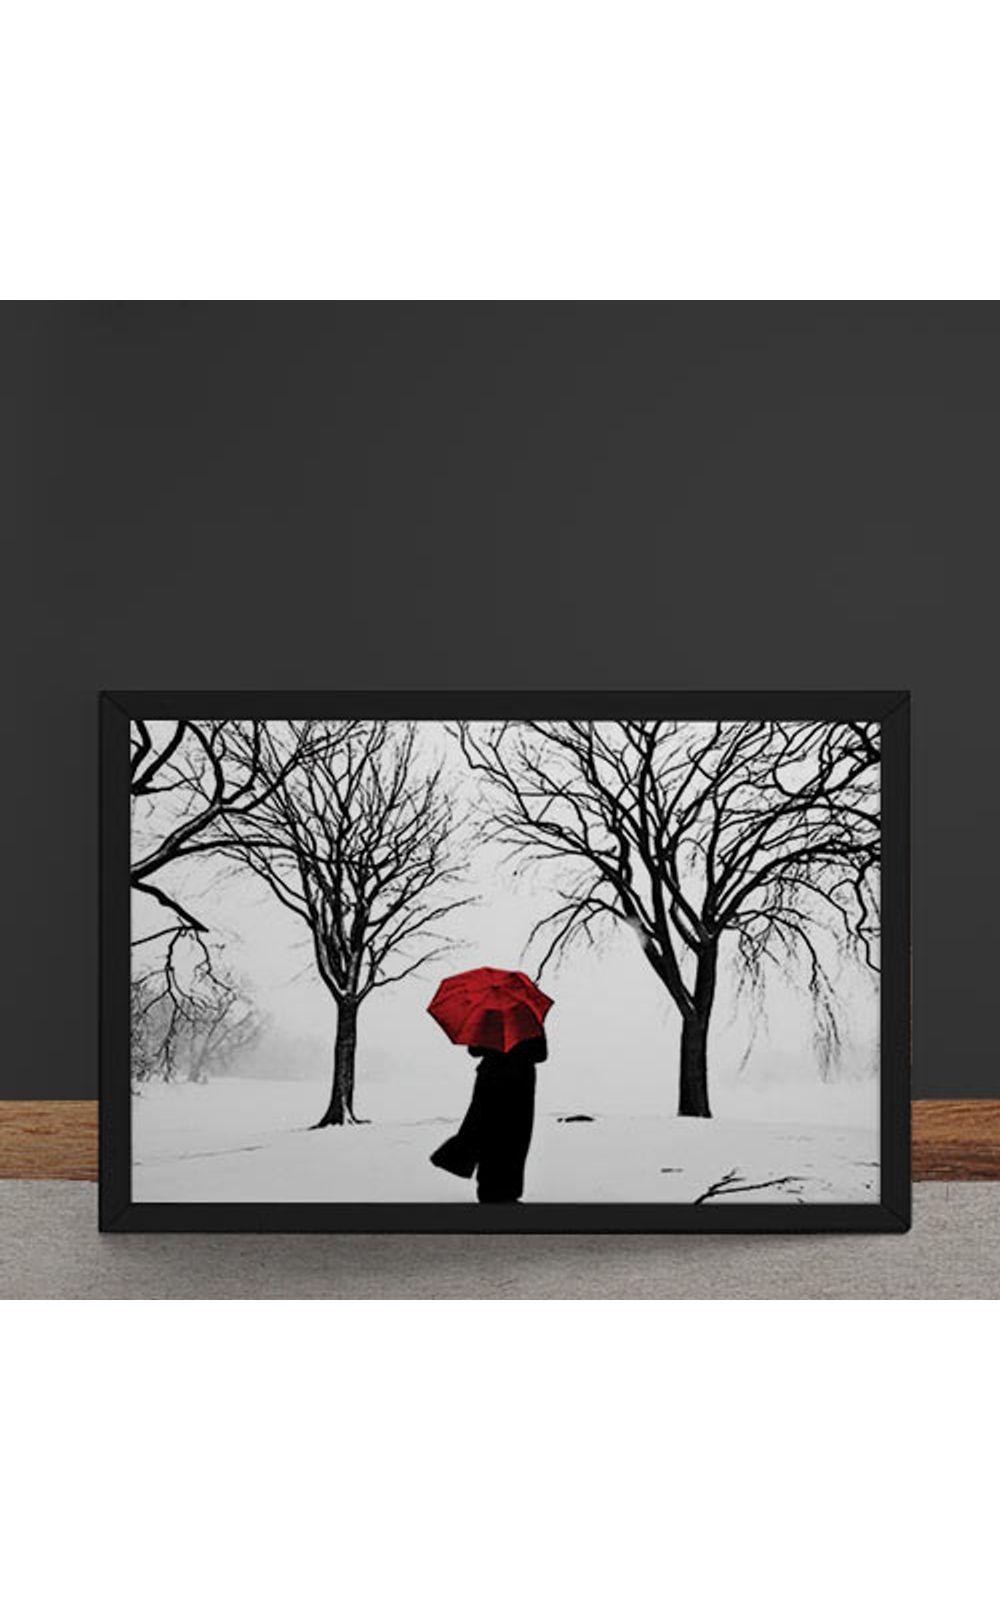 Foto 4 - Quadro Decorativo Guarda Chuva Vermelho na Neve